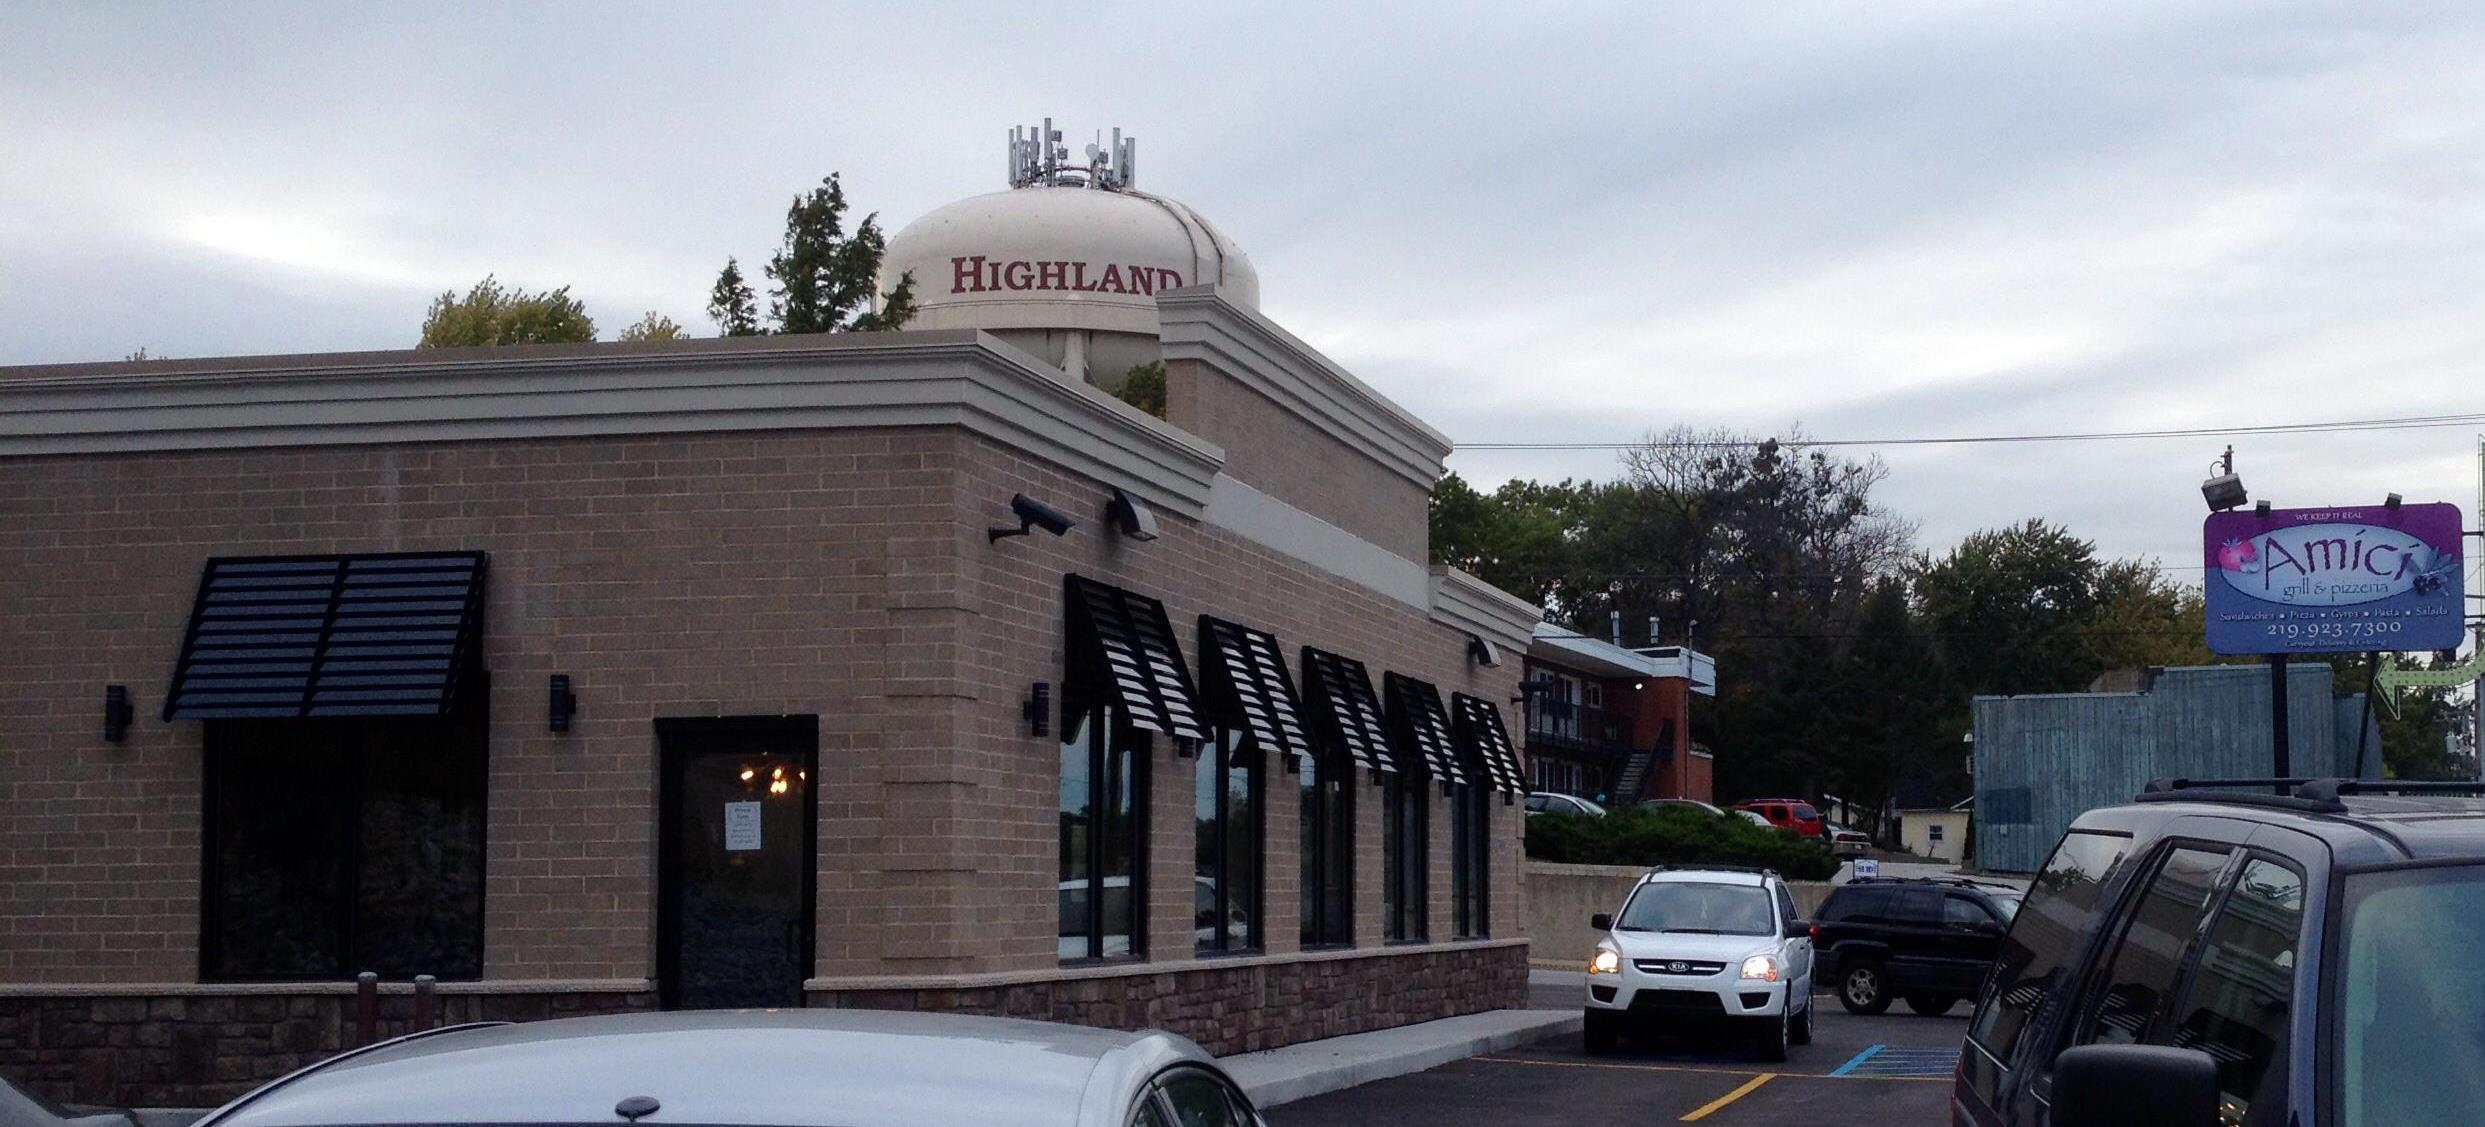 Indiana lake county highland - Amici Grill And Pizzeria Highland Indiana Photo By L Ryskamp